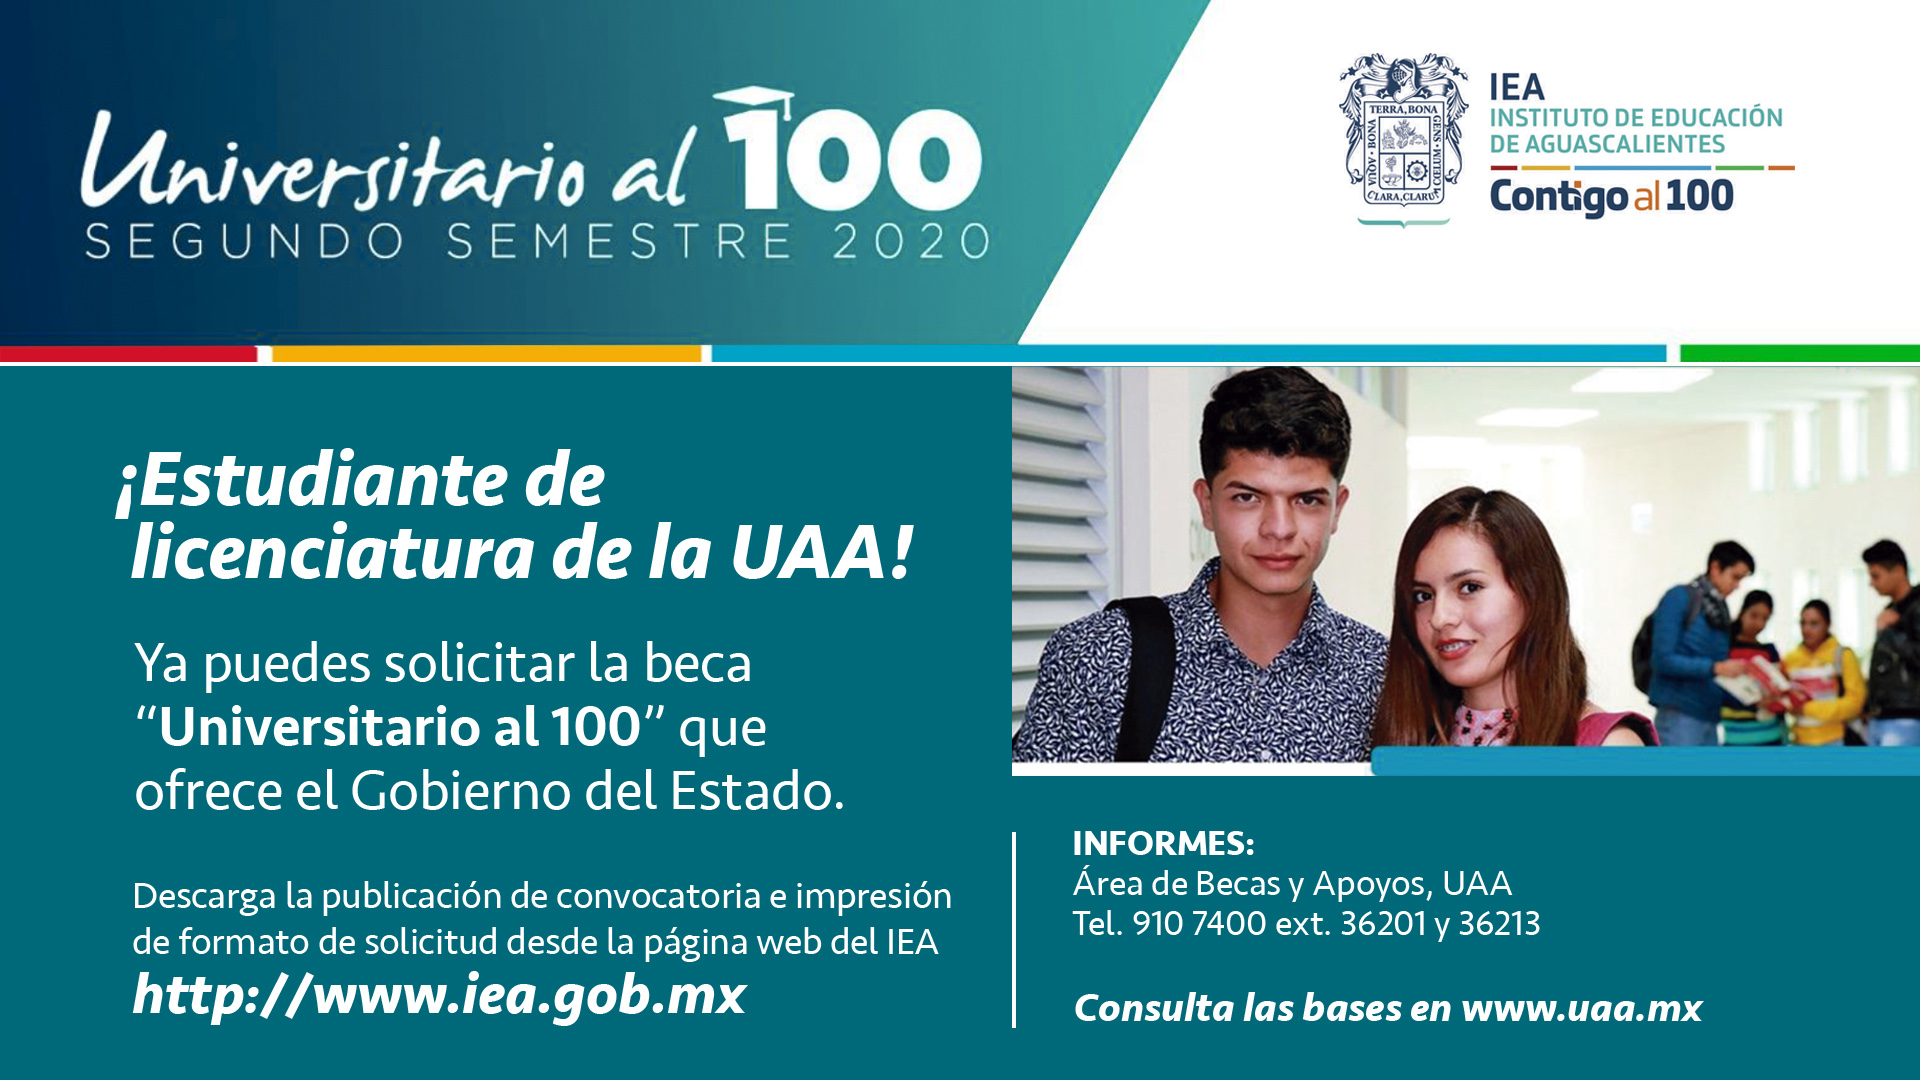 Beca Universitario al 100 Segundo Semestre 202